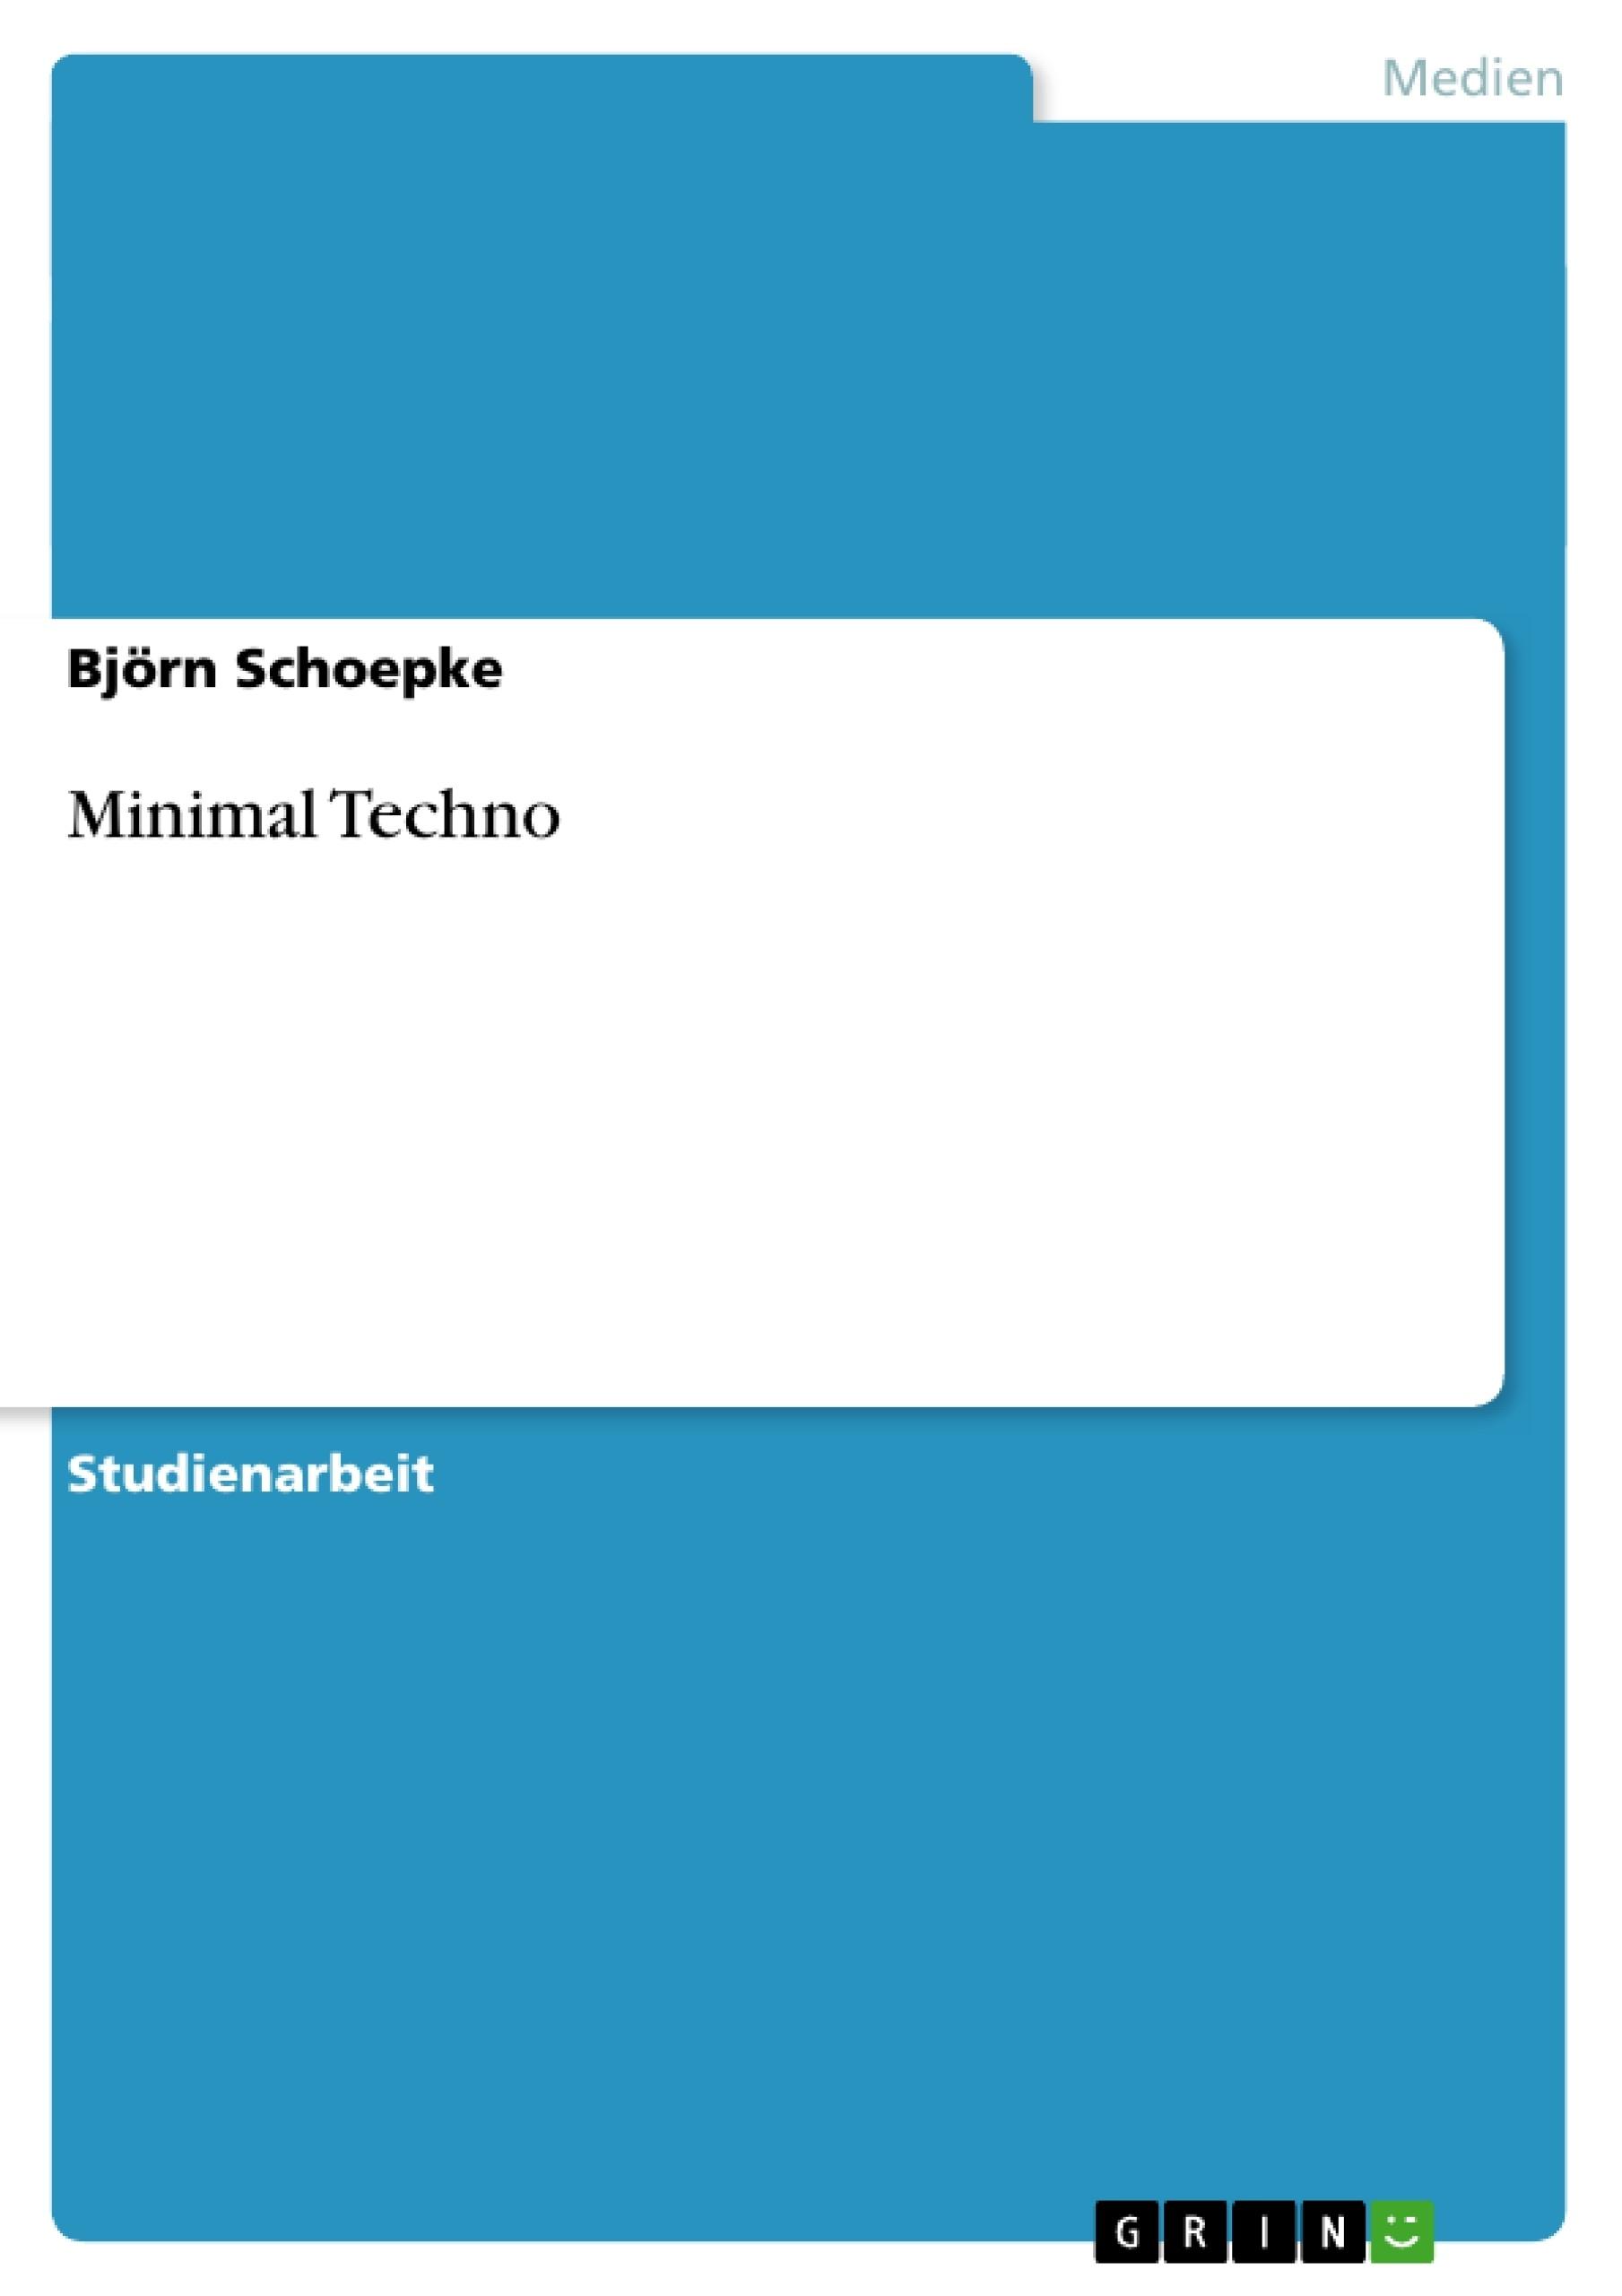 Titel: Minimal Techno